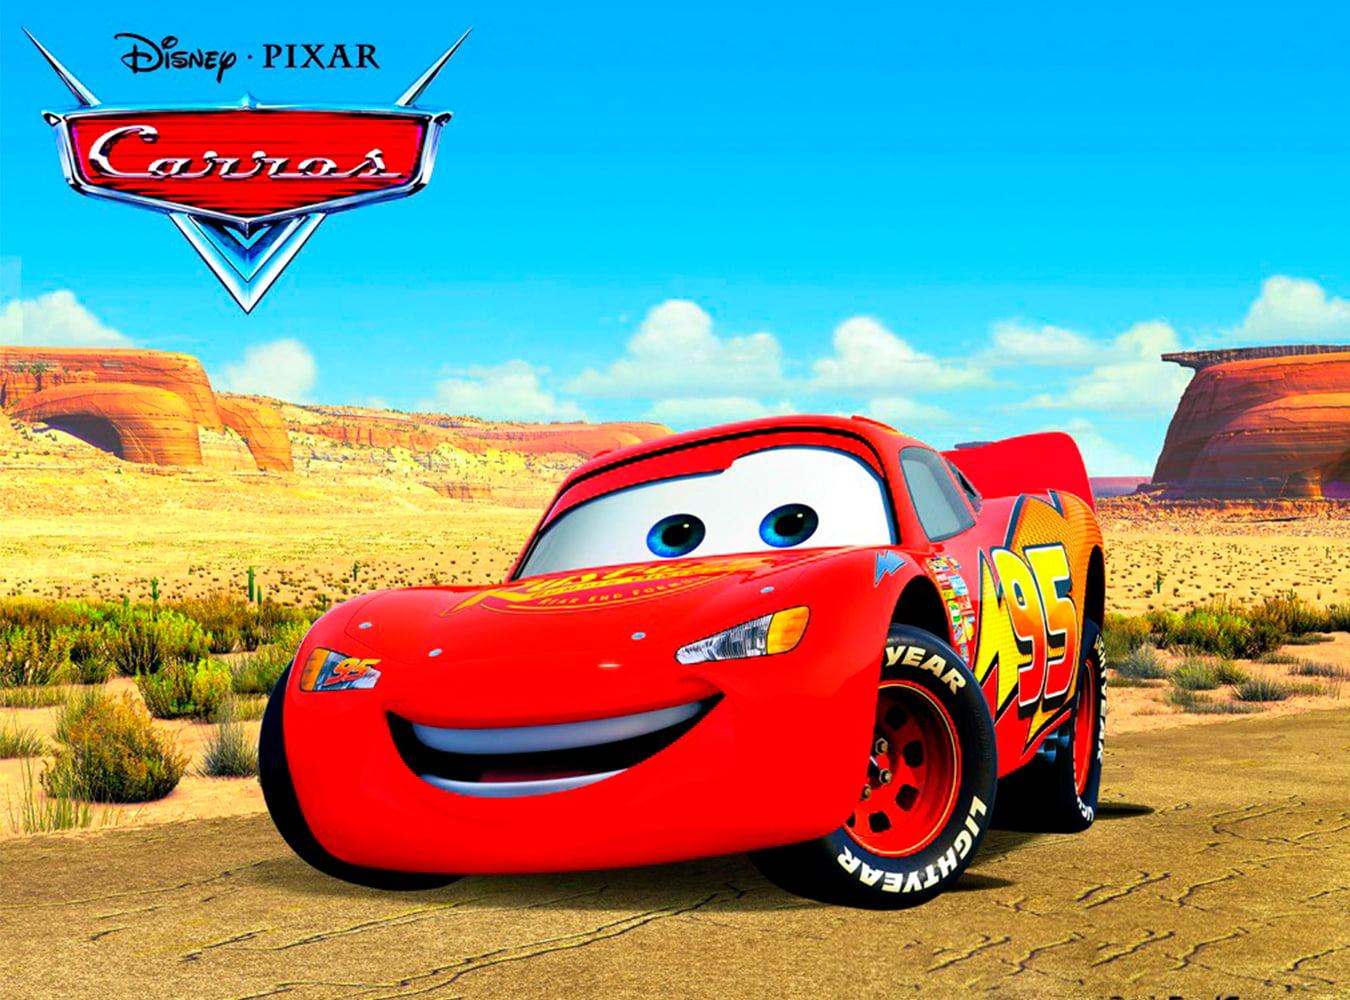 Papel Arroz Carros Disney